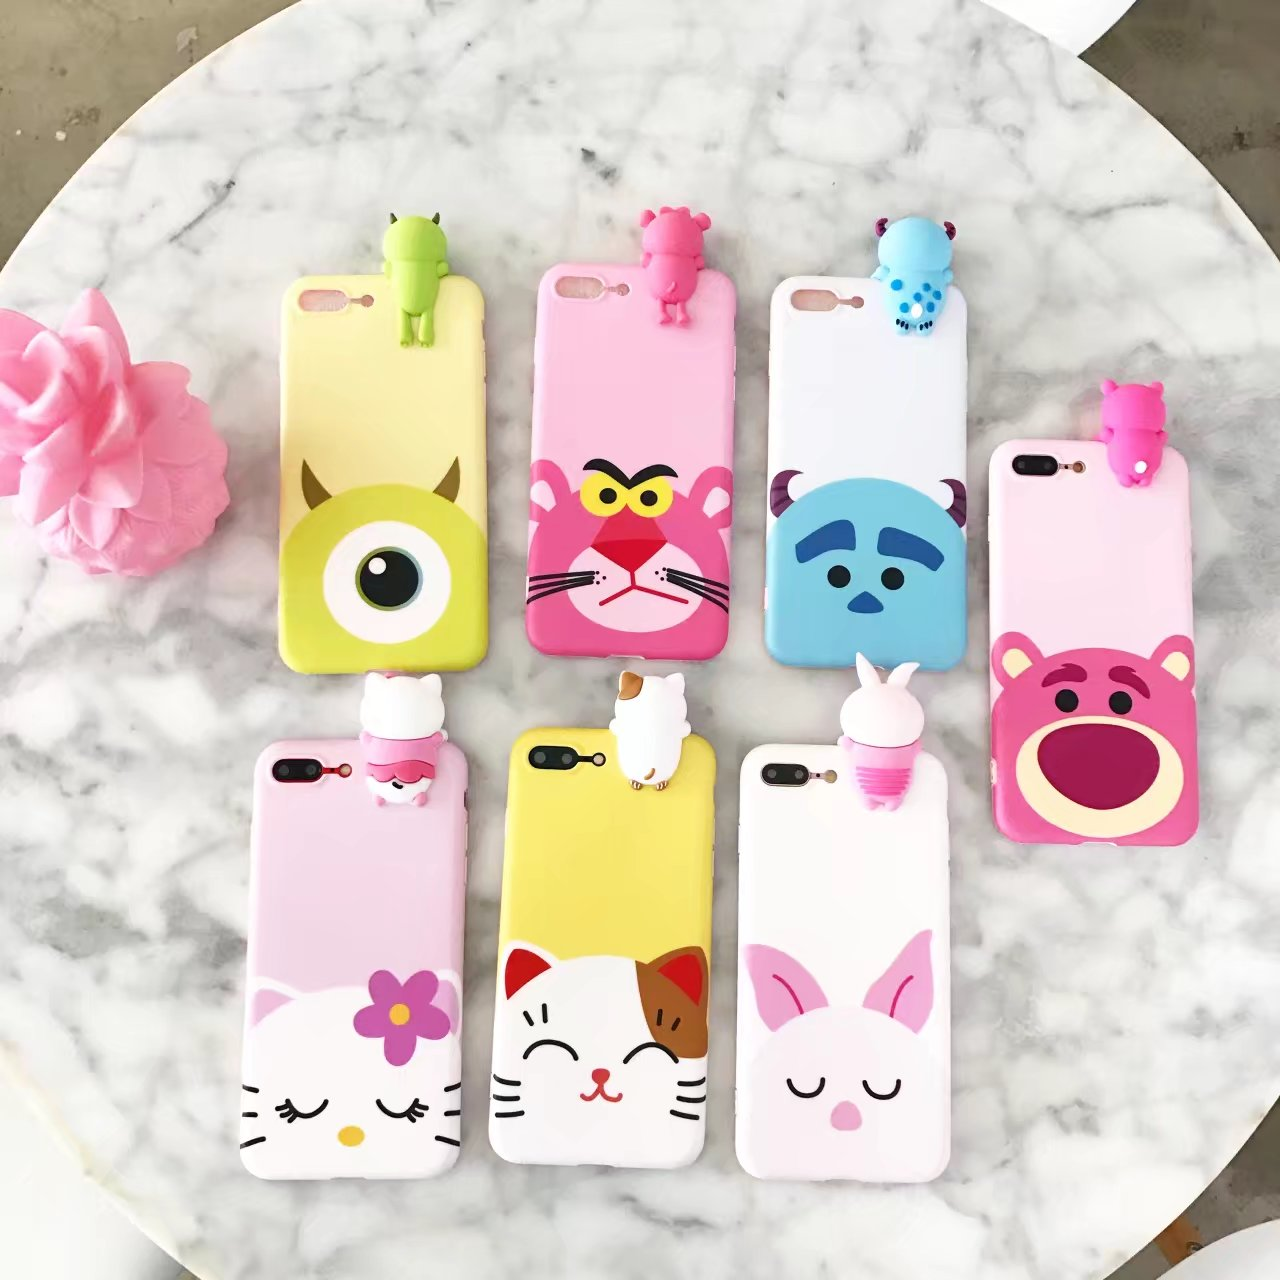 Cute cartoon animals with big eyes - Fashion Cute Silicon 3d Cartoon Soft For Iphone 7 Case 6 6s 7plus Cartoon Animal Lucky